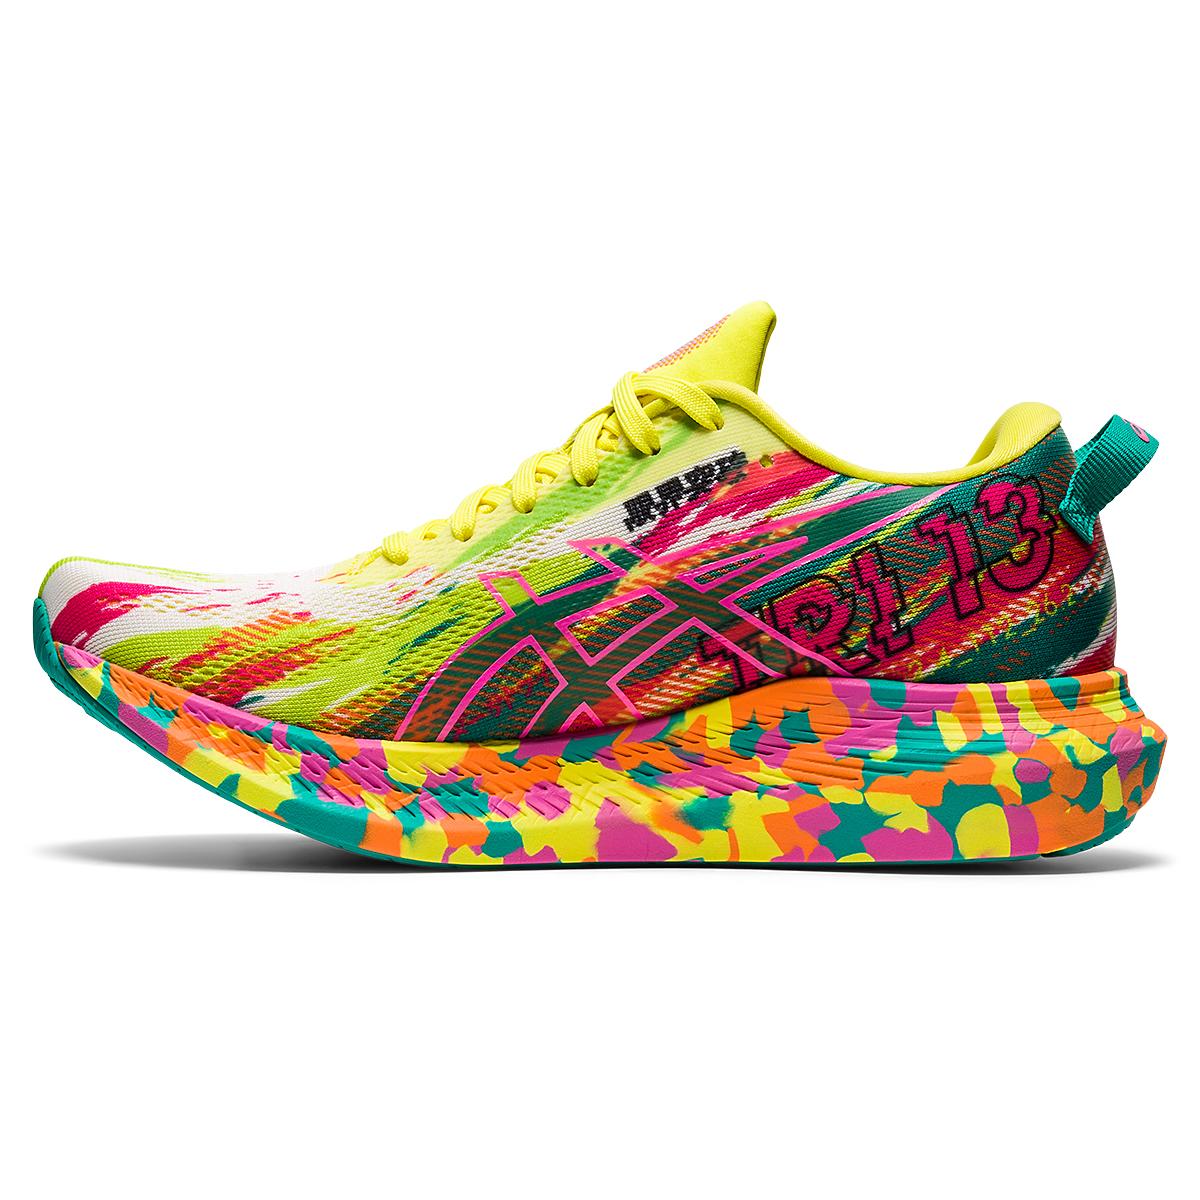 Women's Asics Noosa Tri 13 Running Shoe - Color: Hot Pink/Sour Yuzu - Size: 5 - Width: Regular, Hot Pink/Sour Yuzu, large, image 2